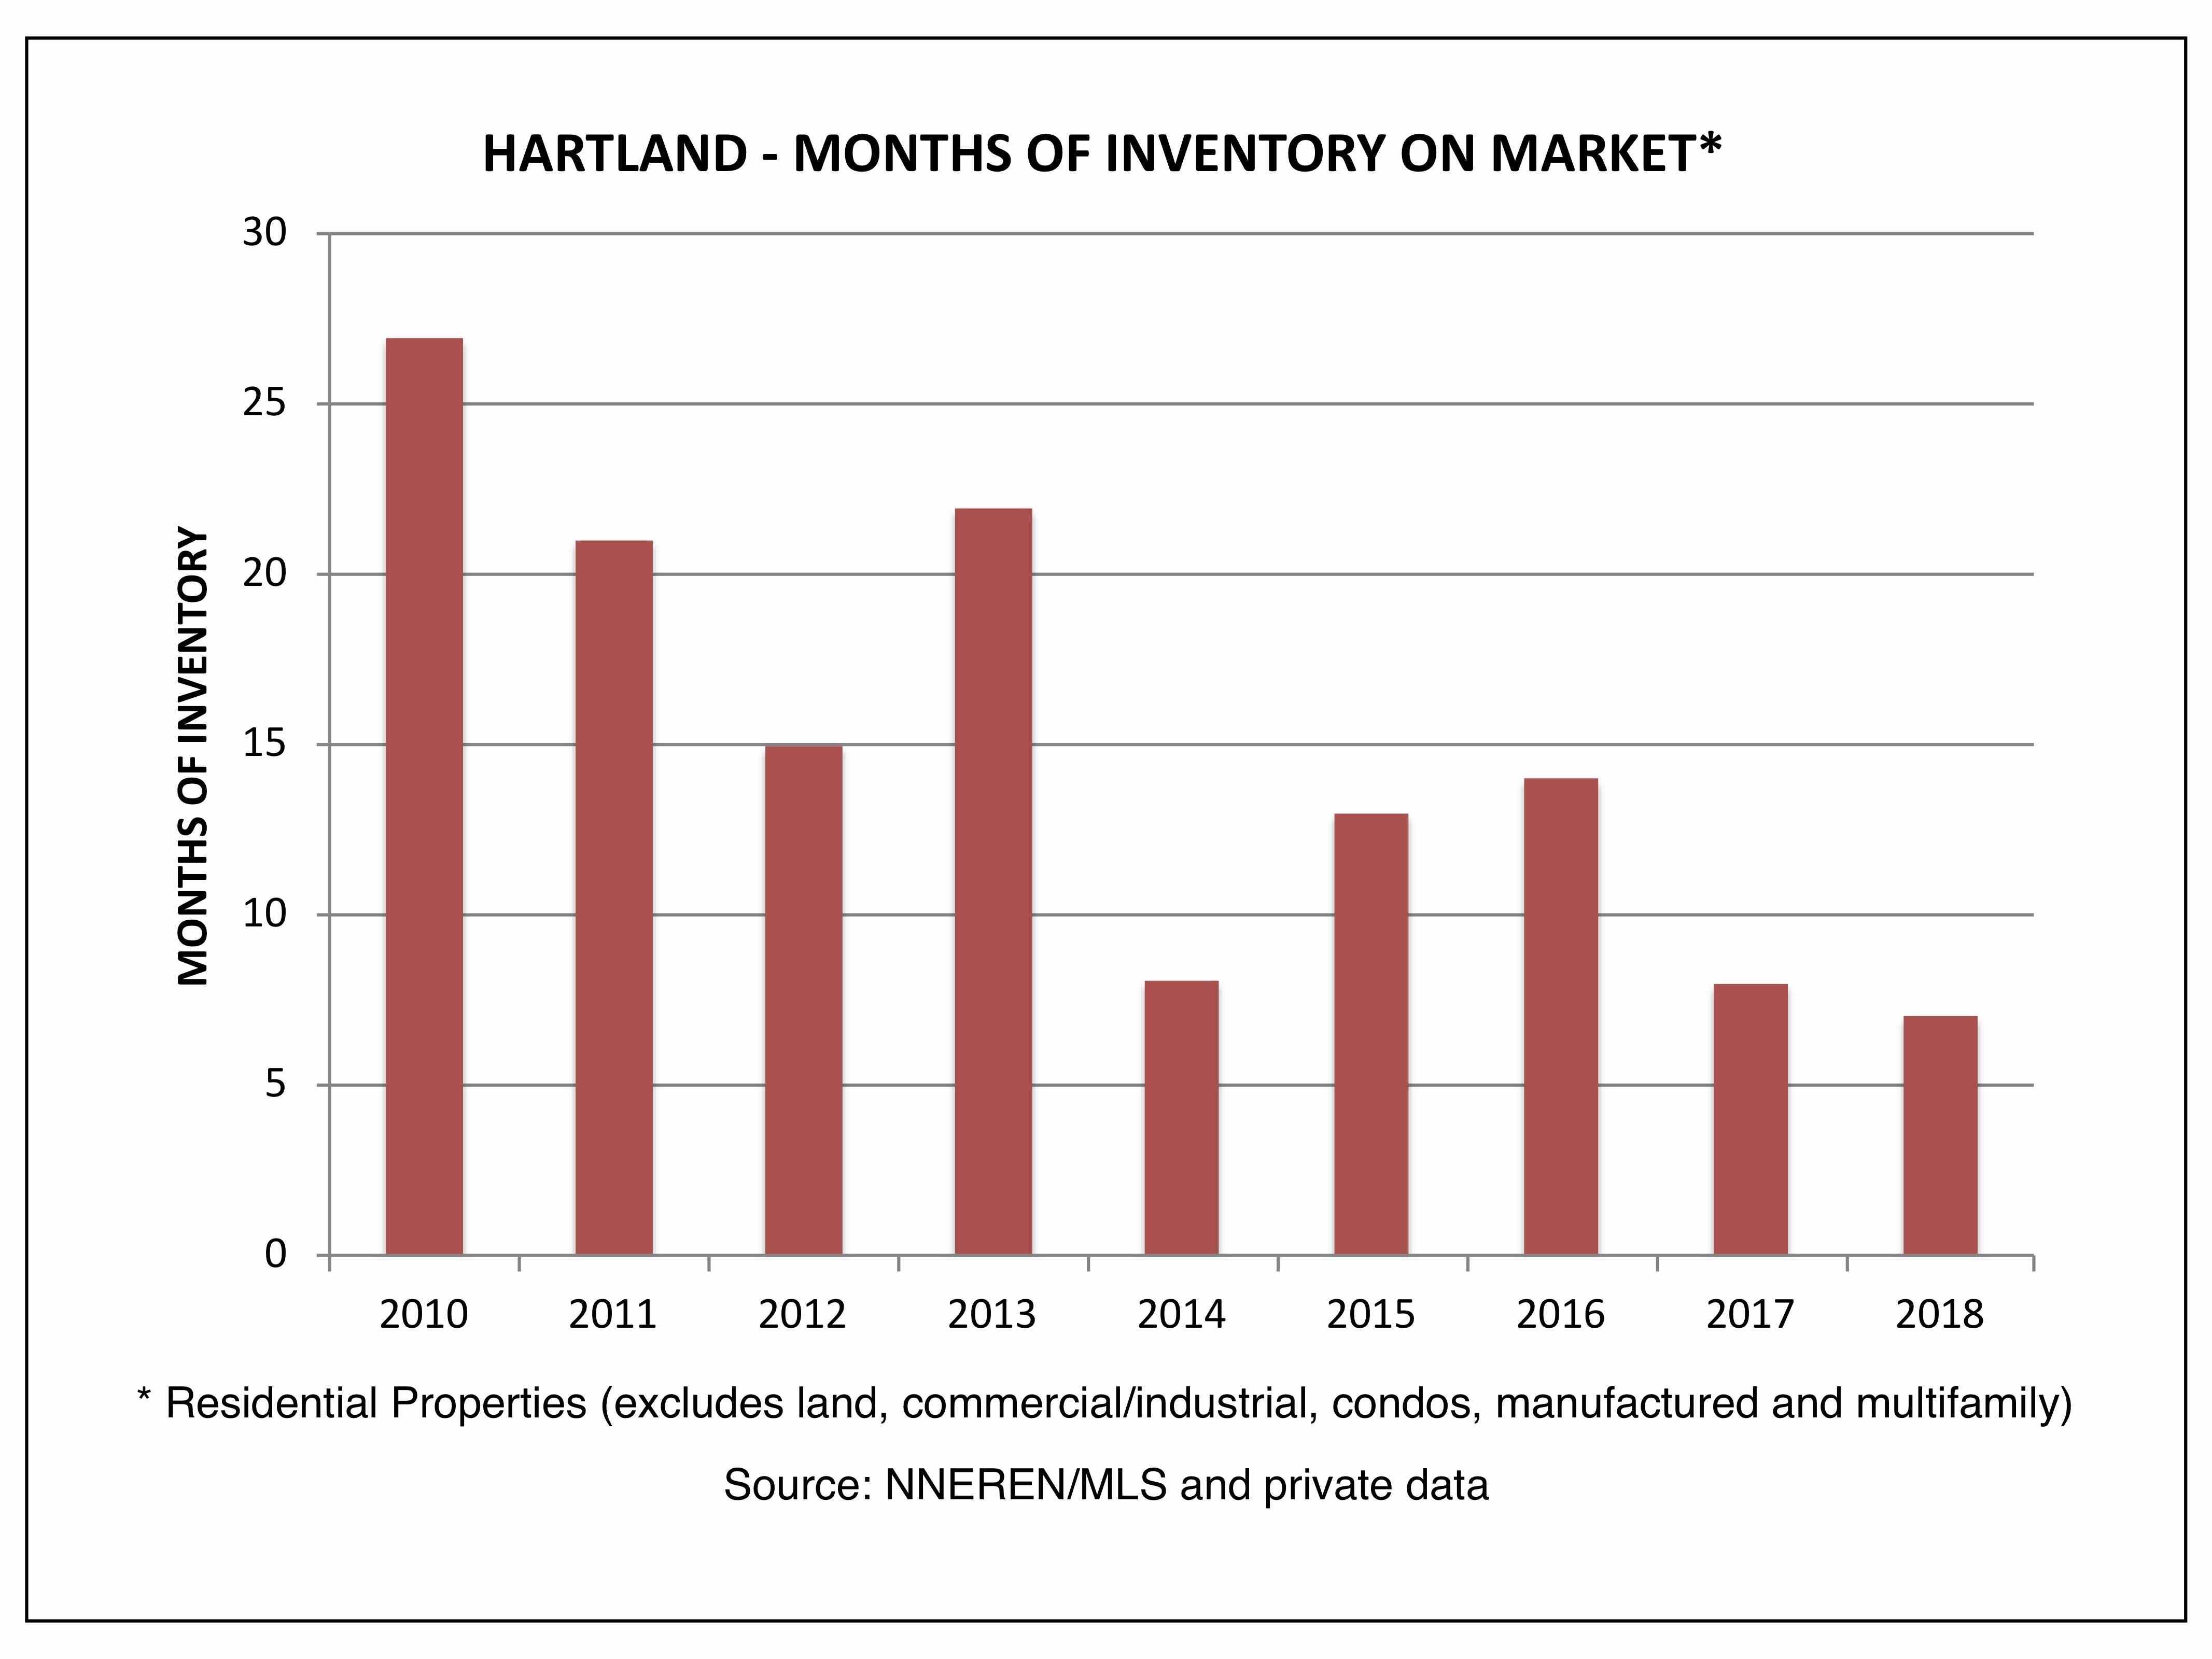 Hartland VT Real Estate - Months of Inventory on Market